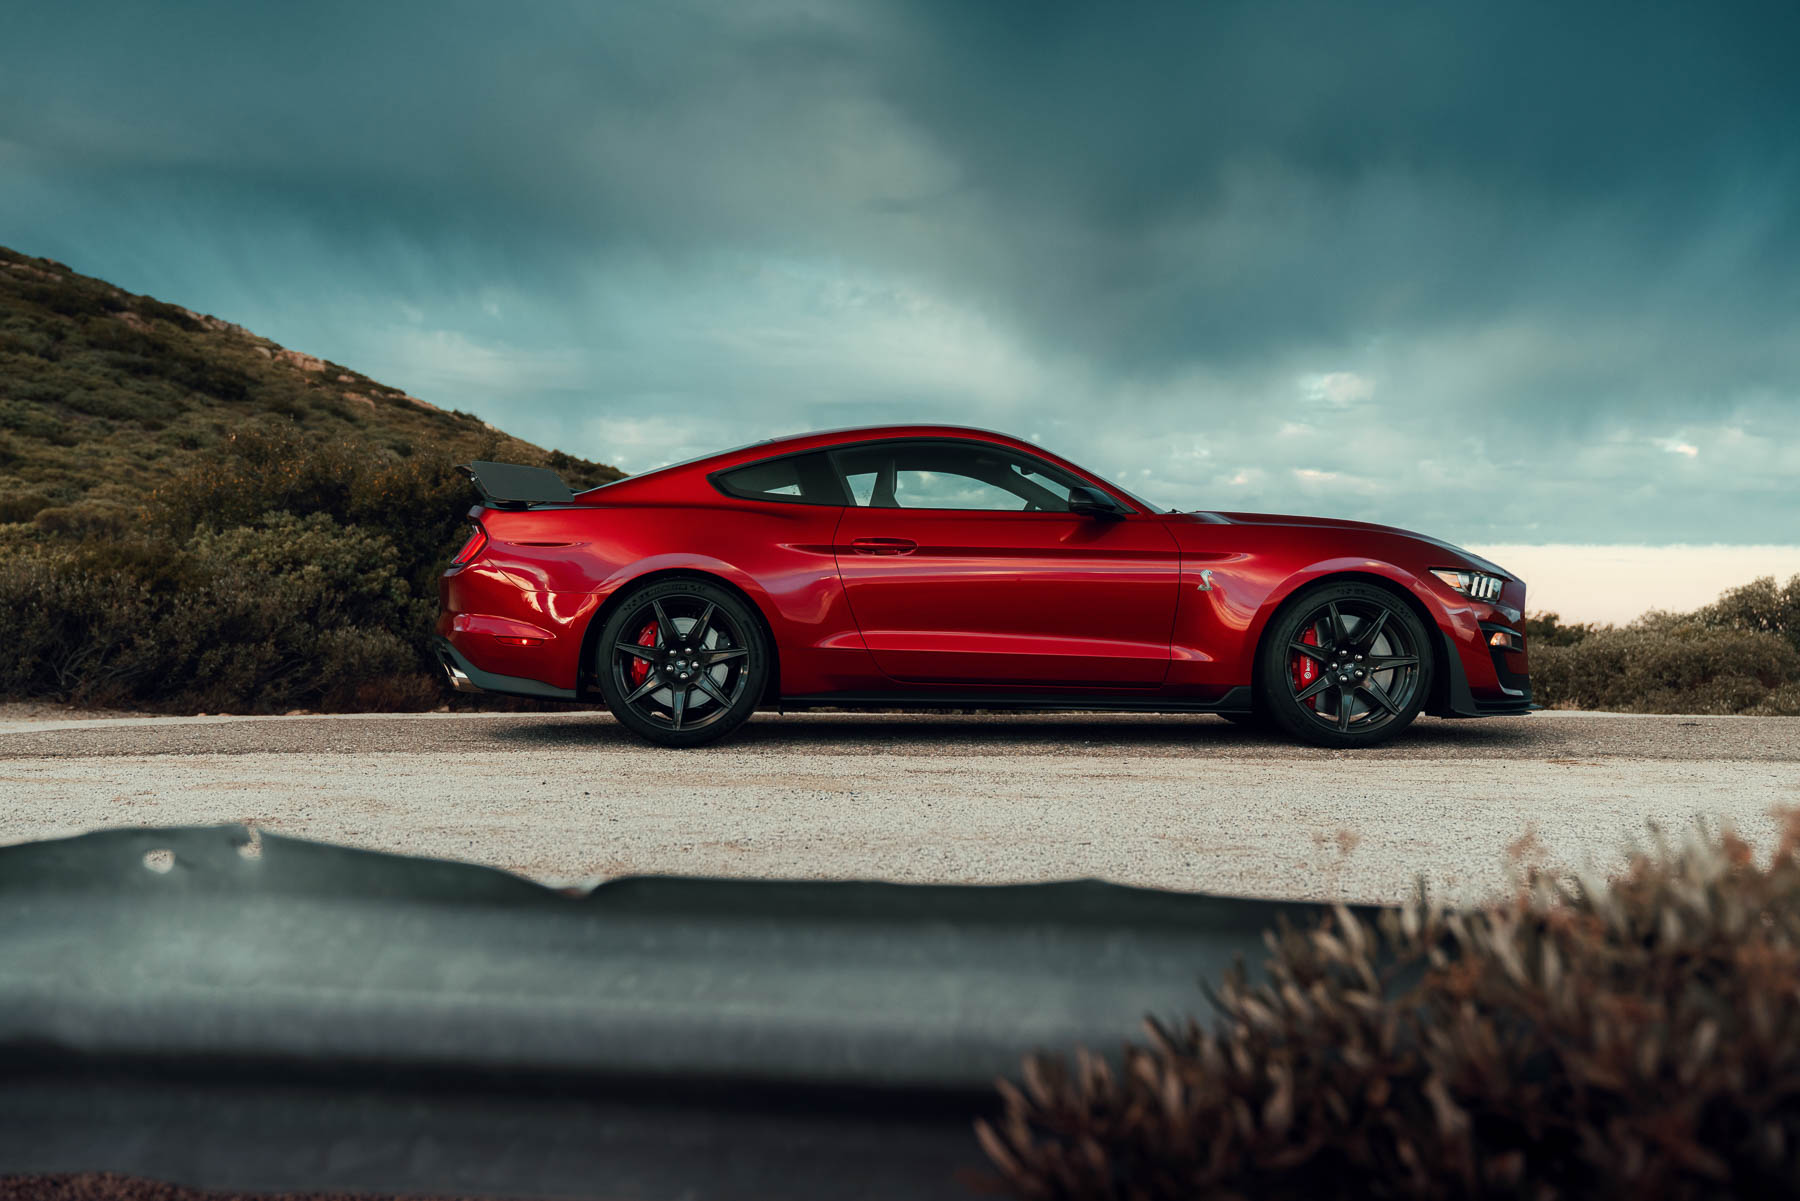 New 2020 Shelby GT500 - Pony Press - Mustang Motorsport ...